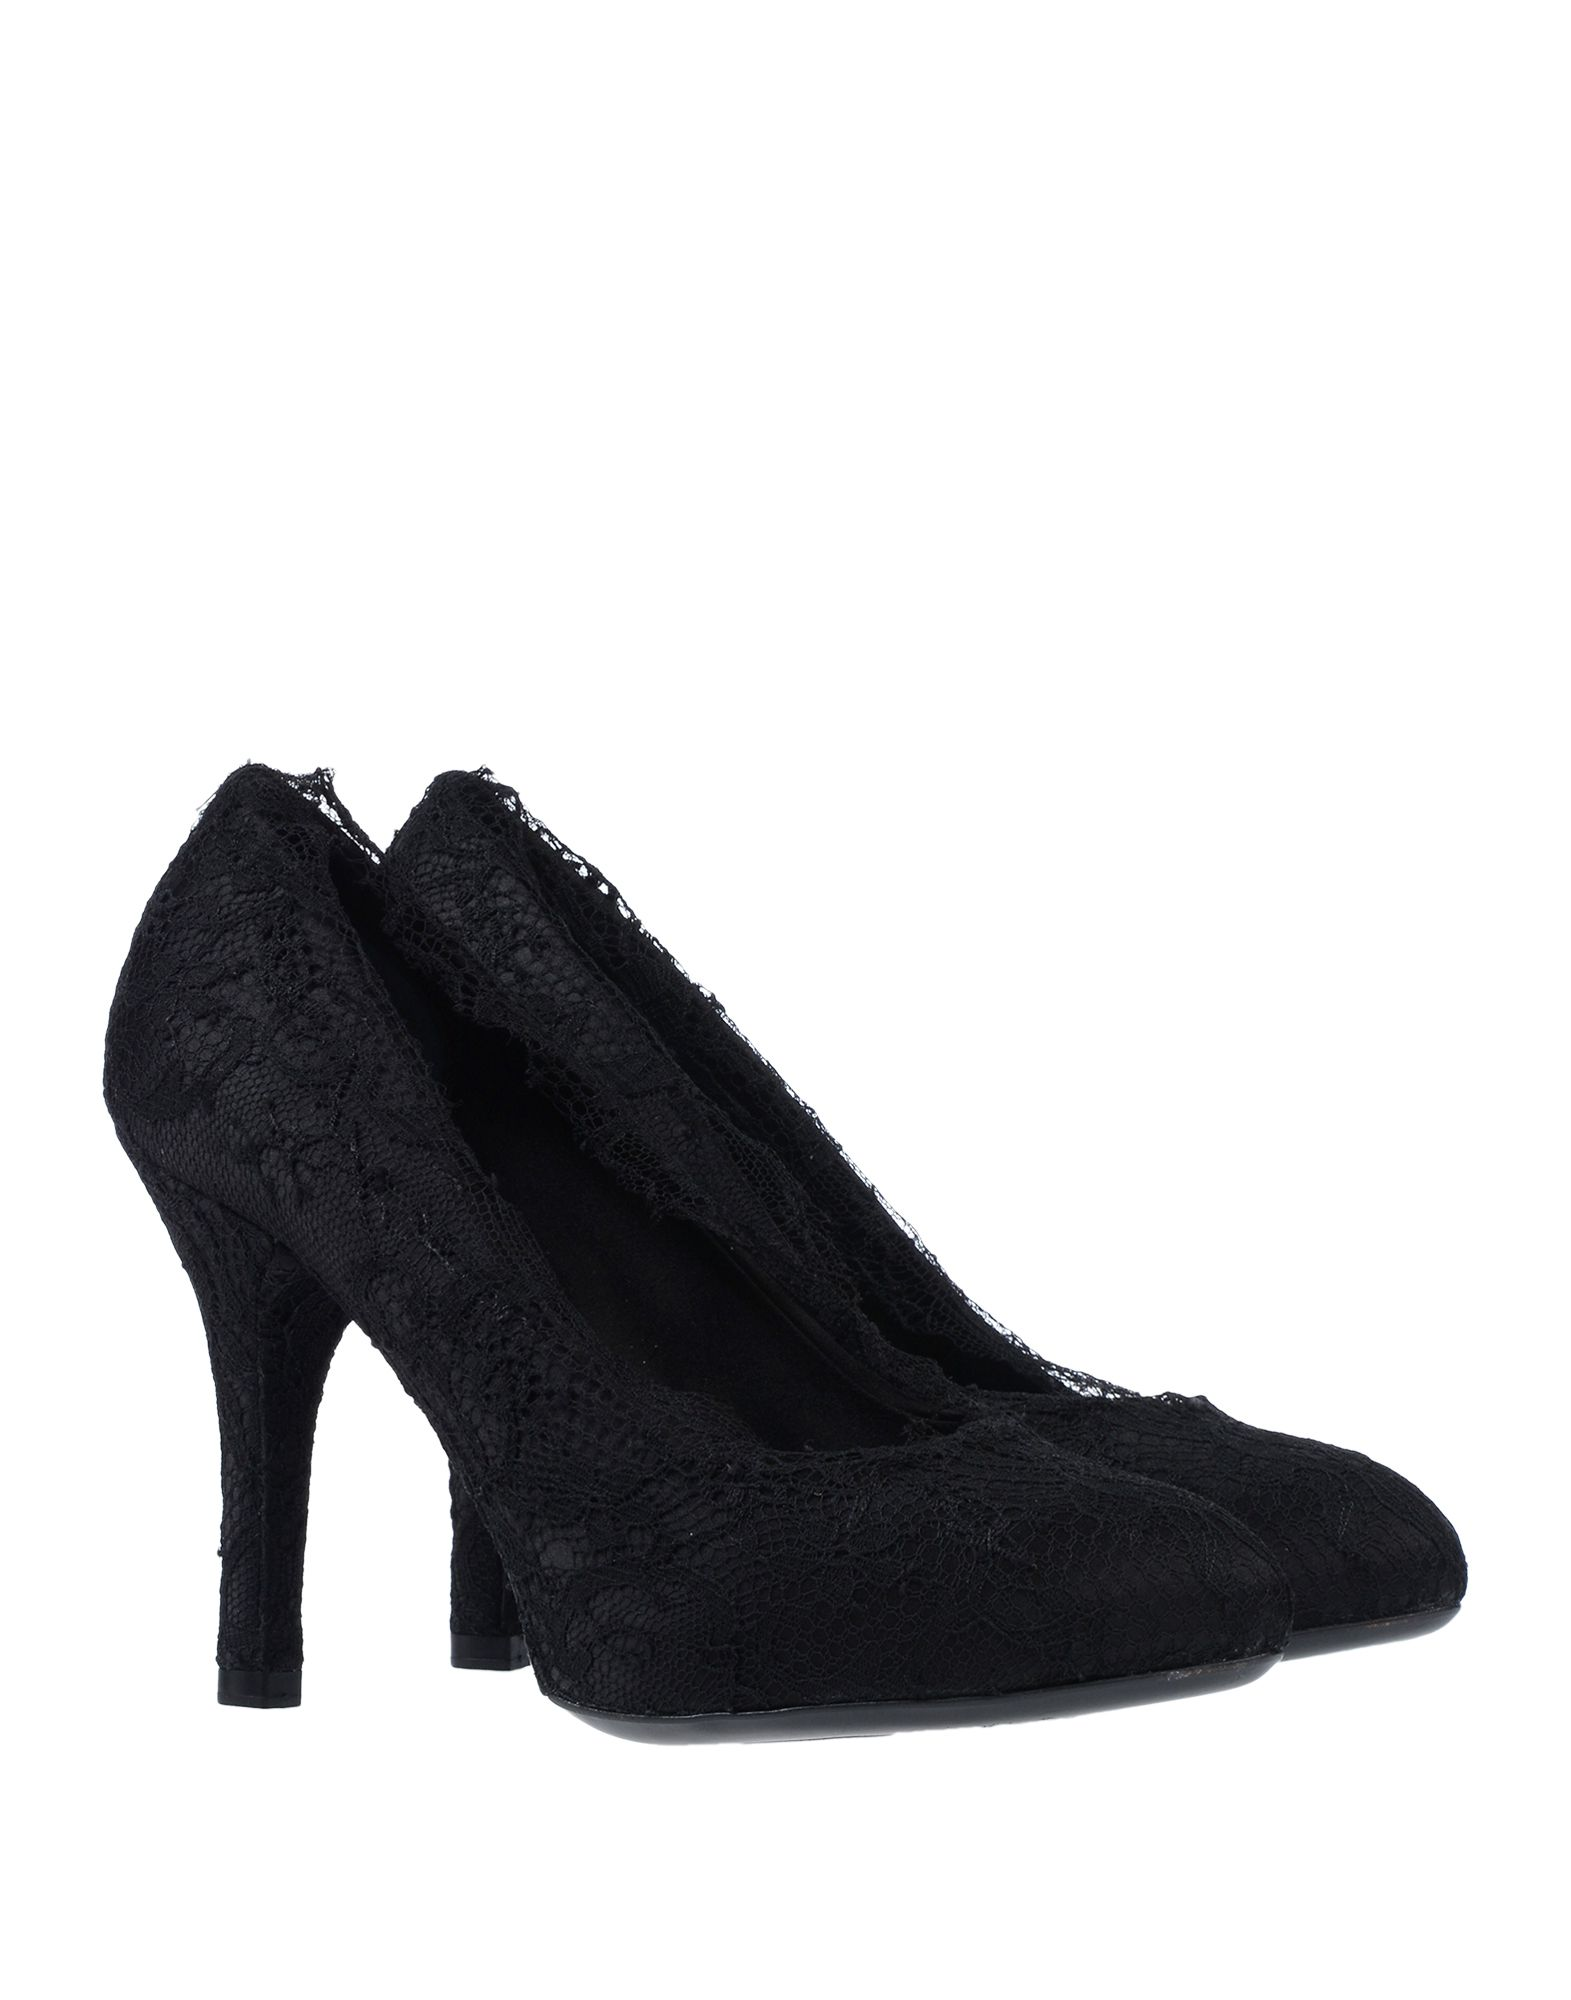 Dolce & Gabbana Pumps Damen Gutes Preis-Leistungs-Verhältnis, Preis-Leistungs-Verhältnis, Preis-Leistungs-Verhältnis, es lohnt sich ffc1b9